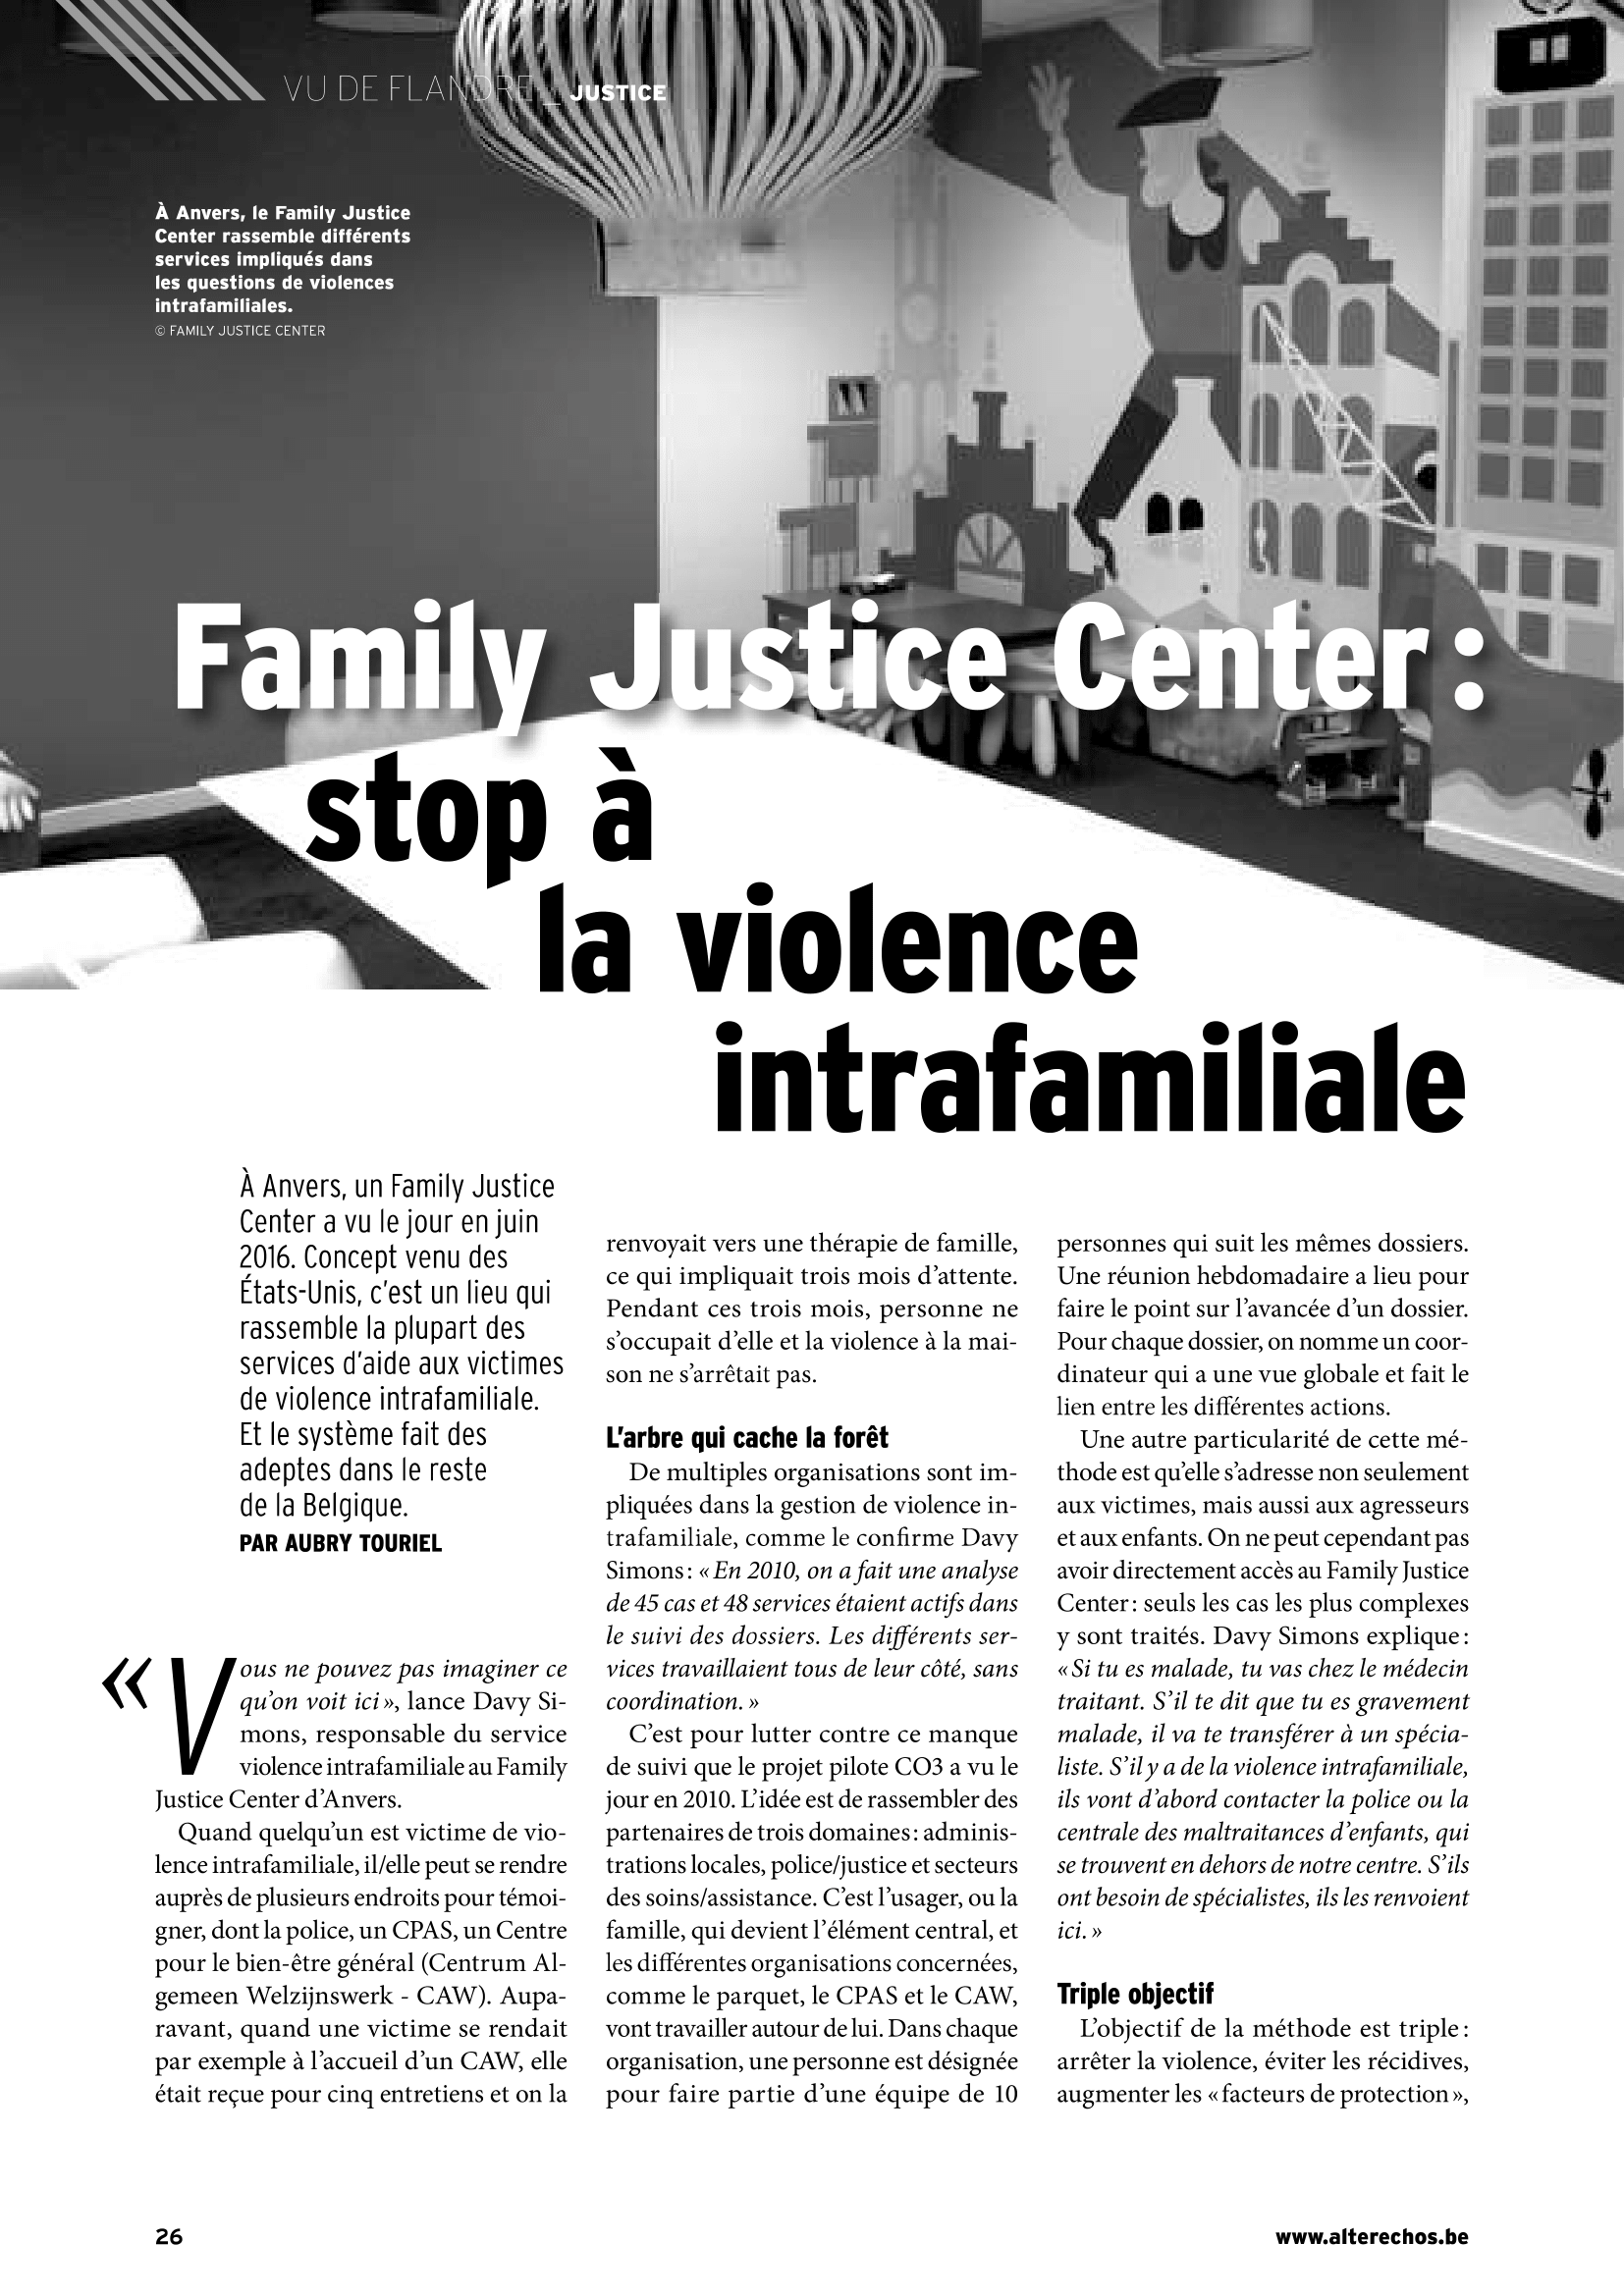 Family justice center: stop à la violence intrafamiliale